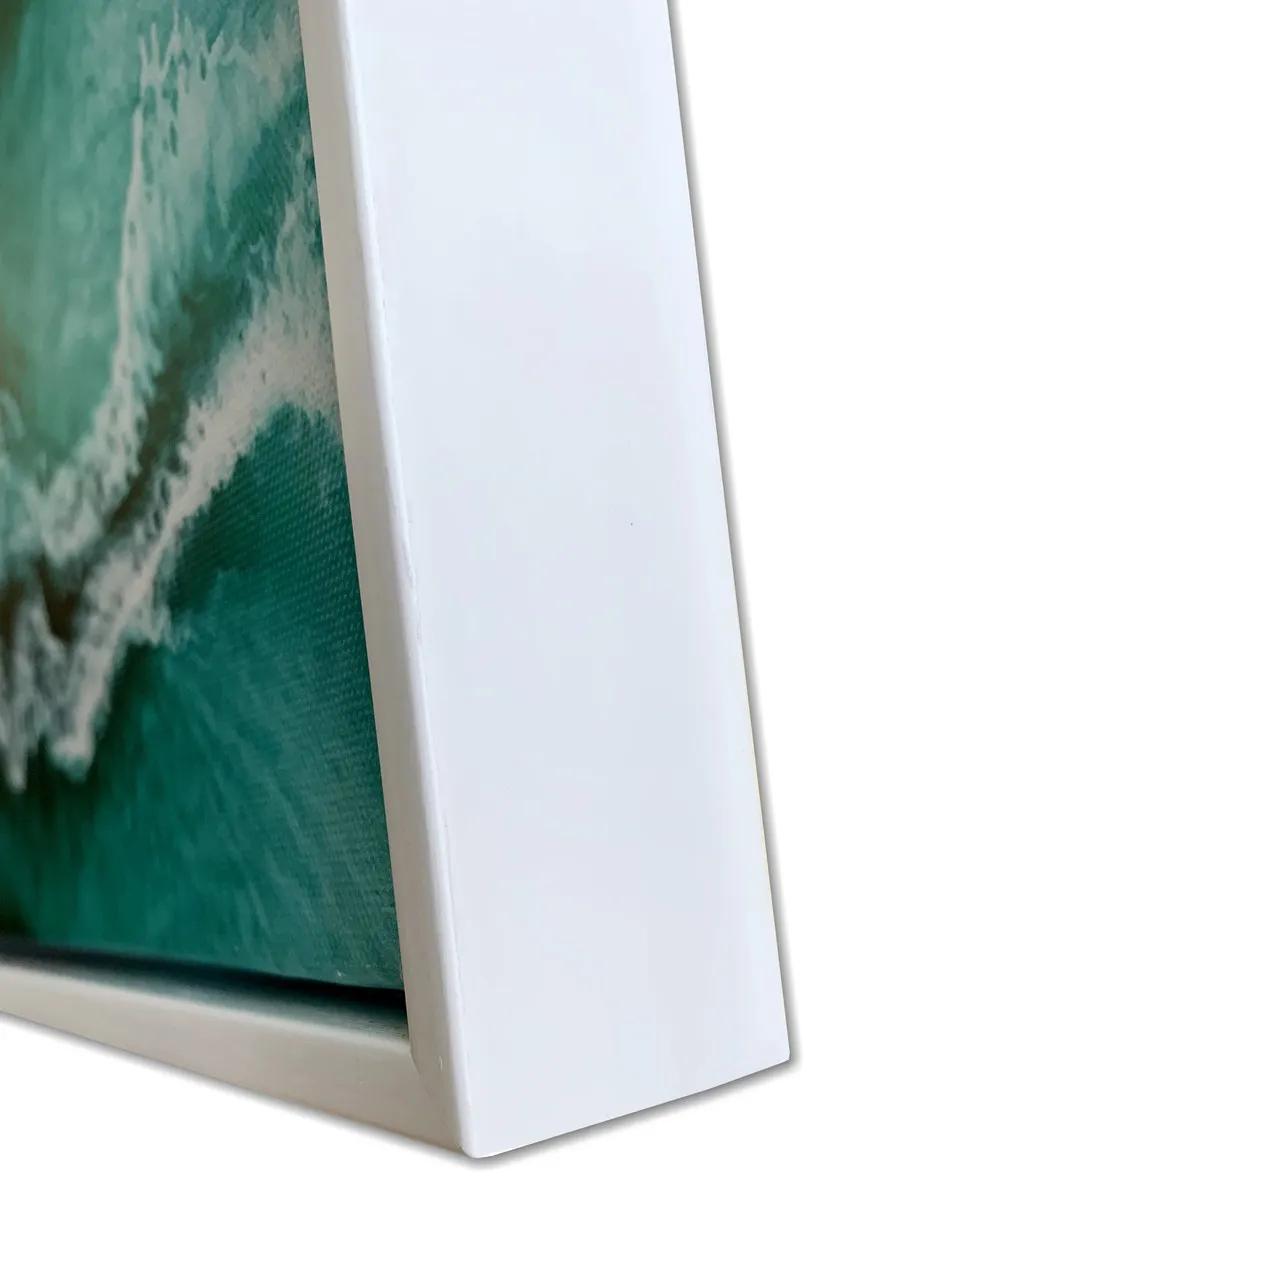 Quadro Decor Mar Abstrato 3